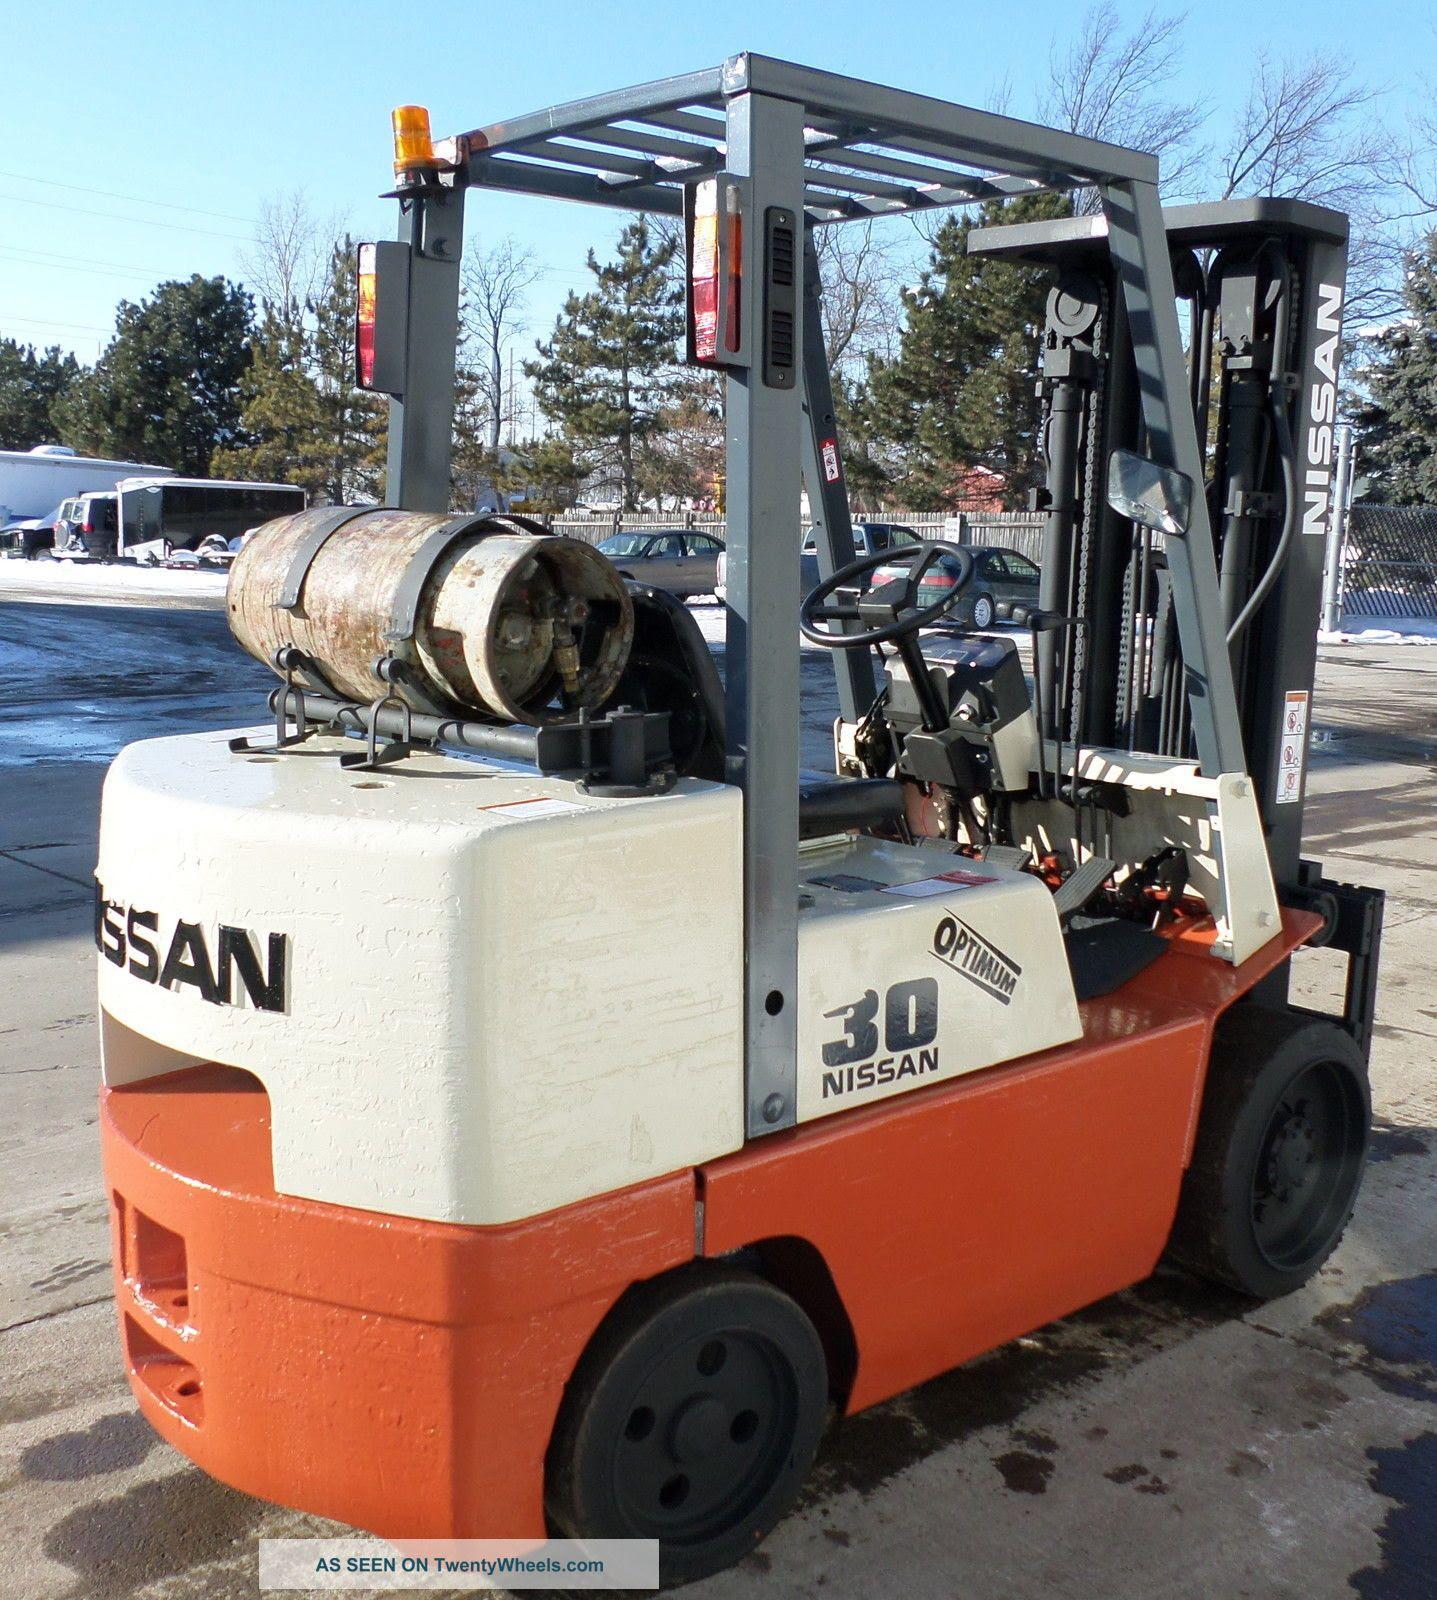 Nissan Optimum 30 Forklift